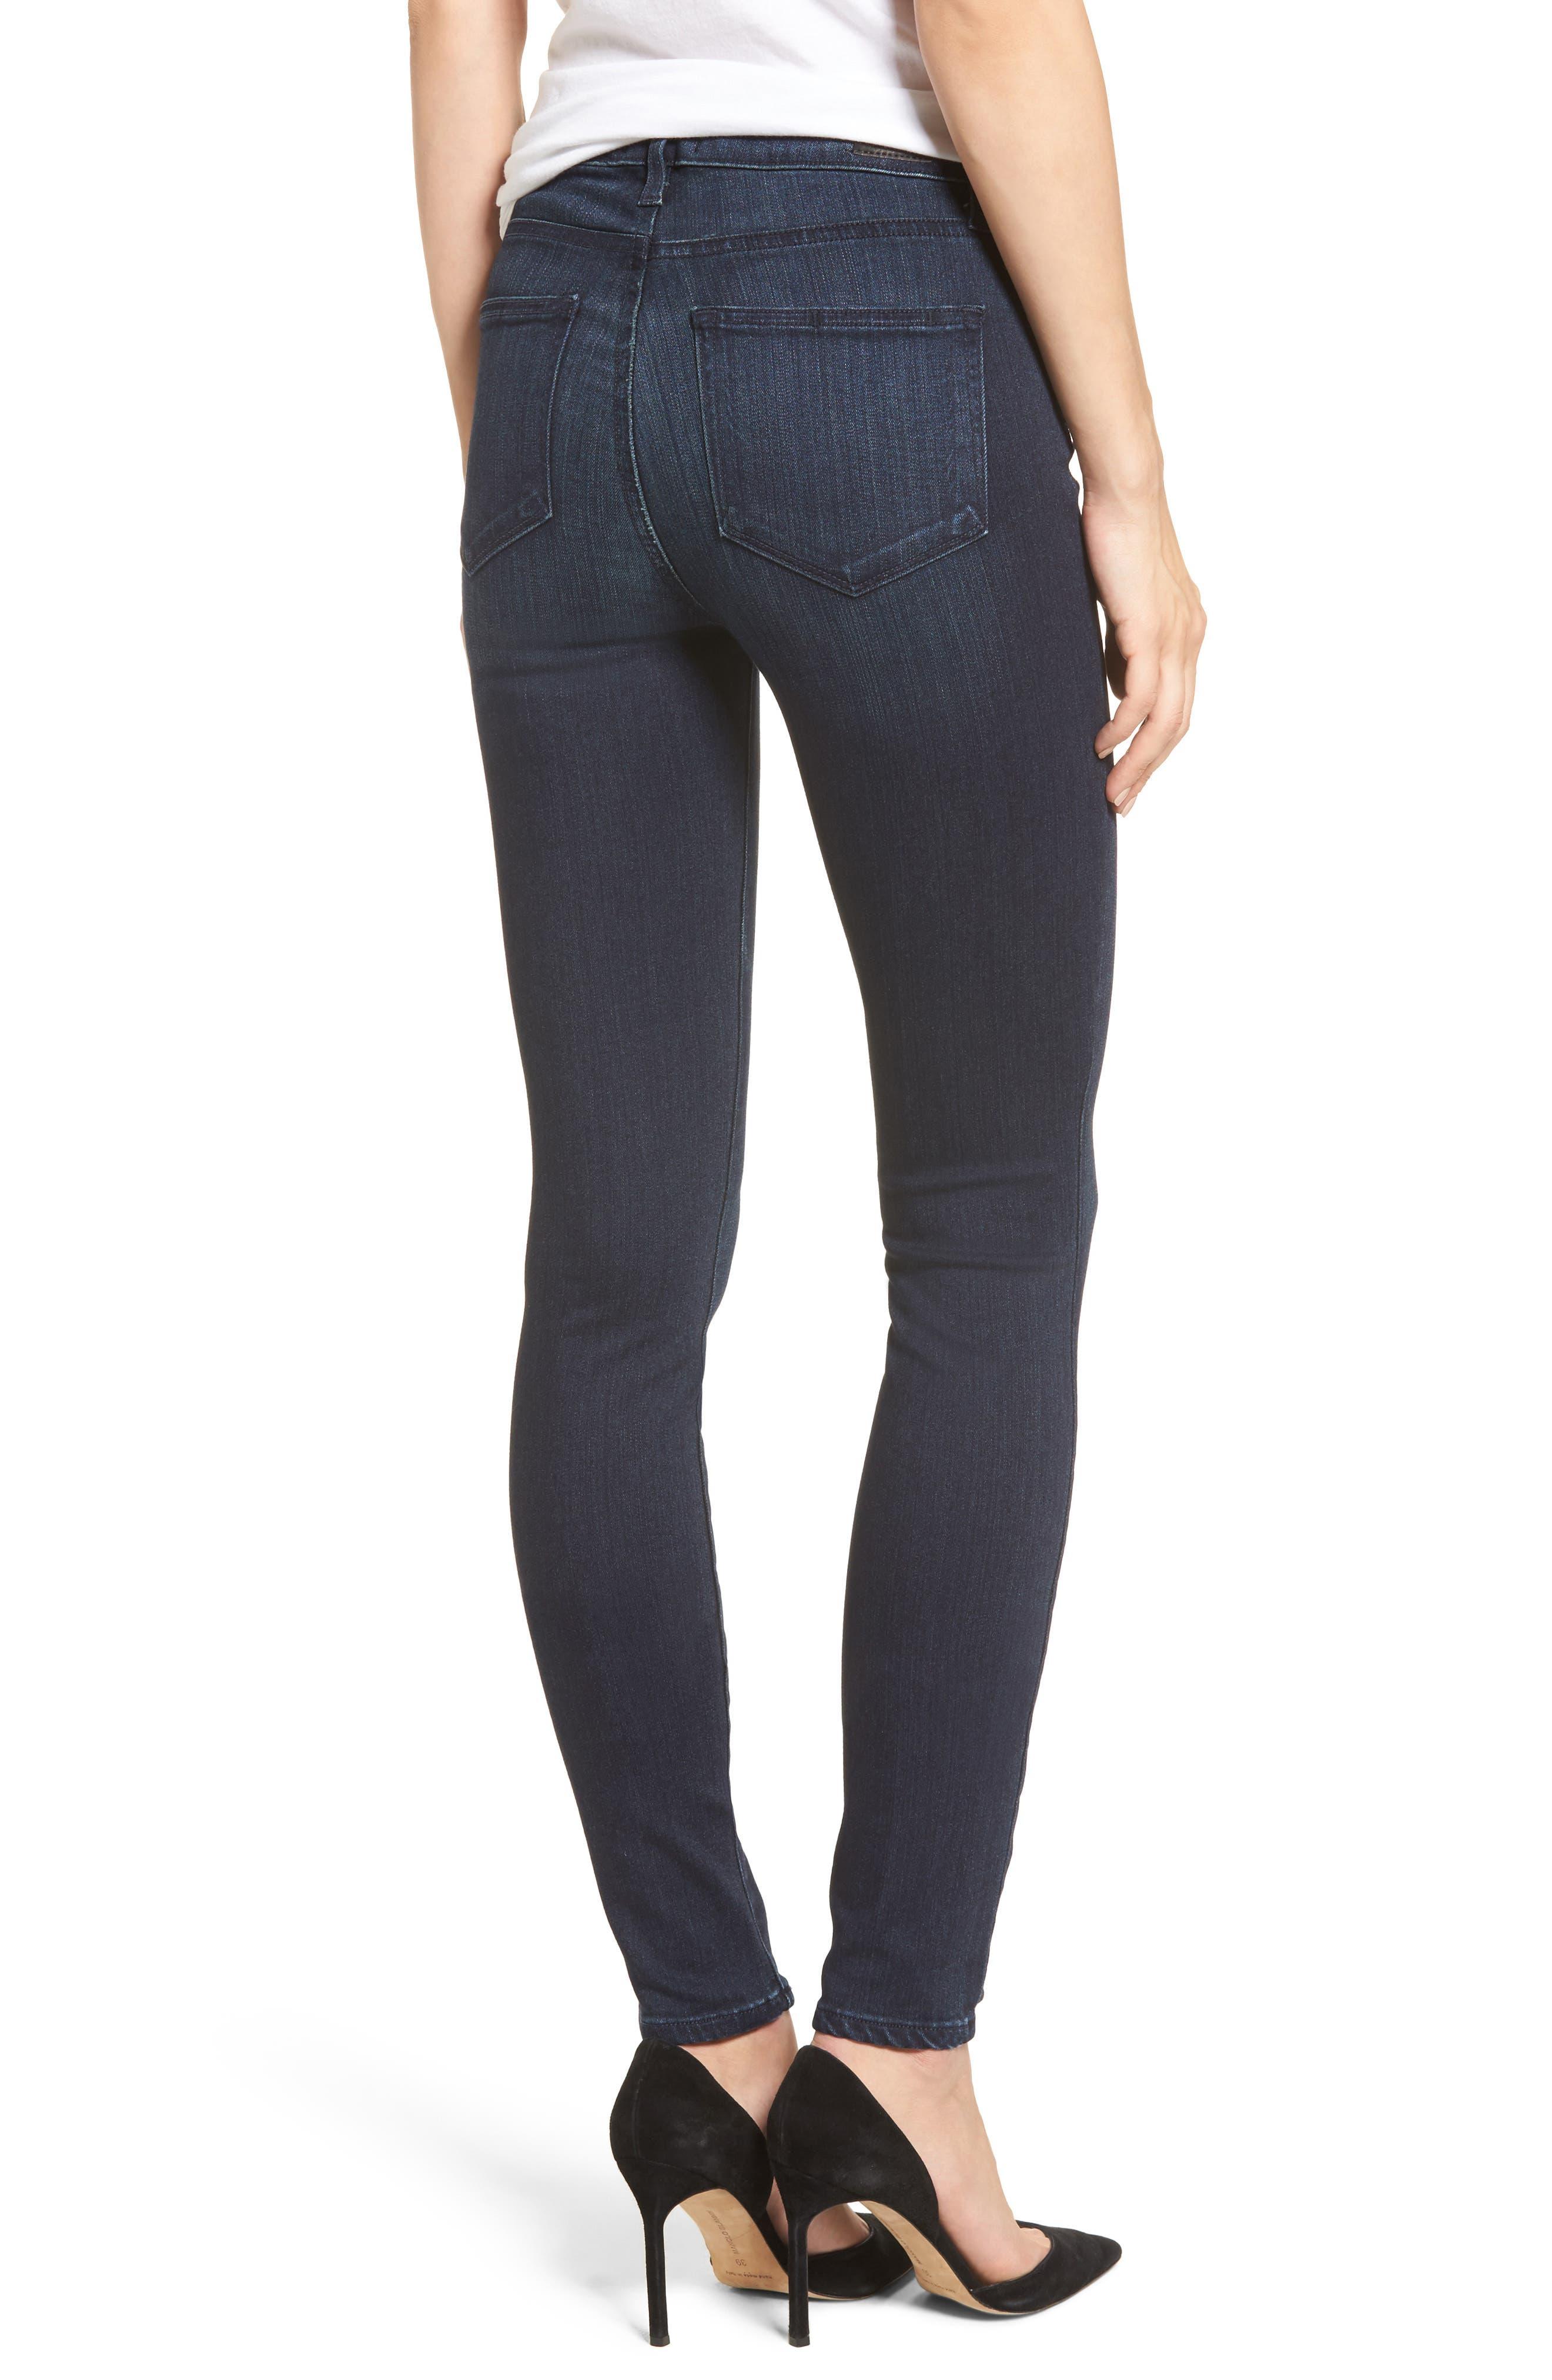 Transcend - Hoxton High Waist Ultra Skinny Jeans,                             Alternate thumbnail 2, color,                             Midlake